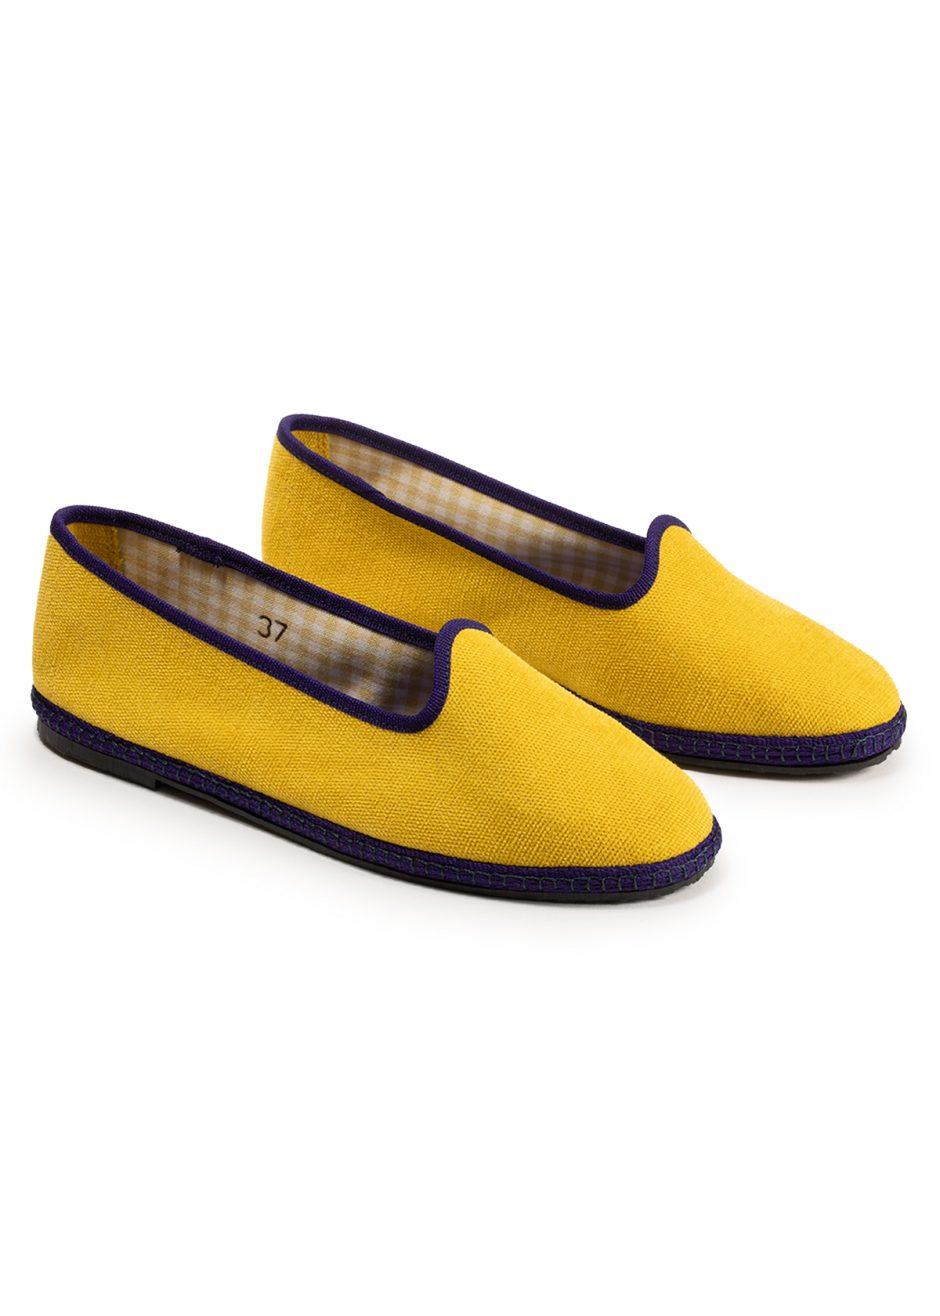 Peggy – Furlana mustard cotton